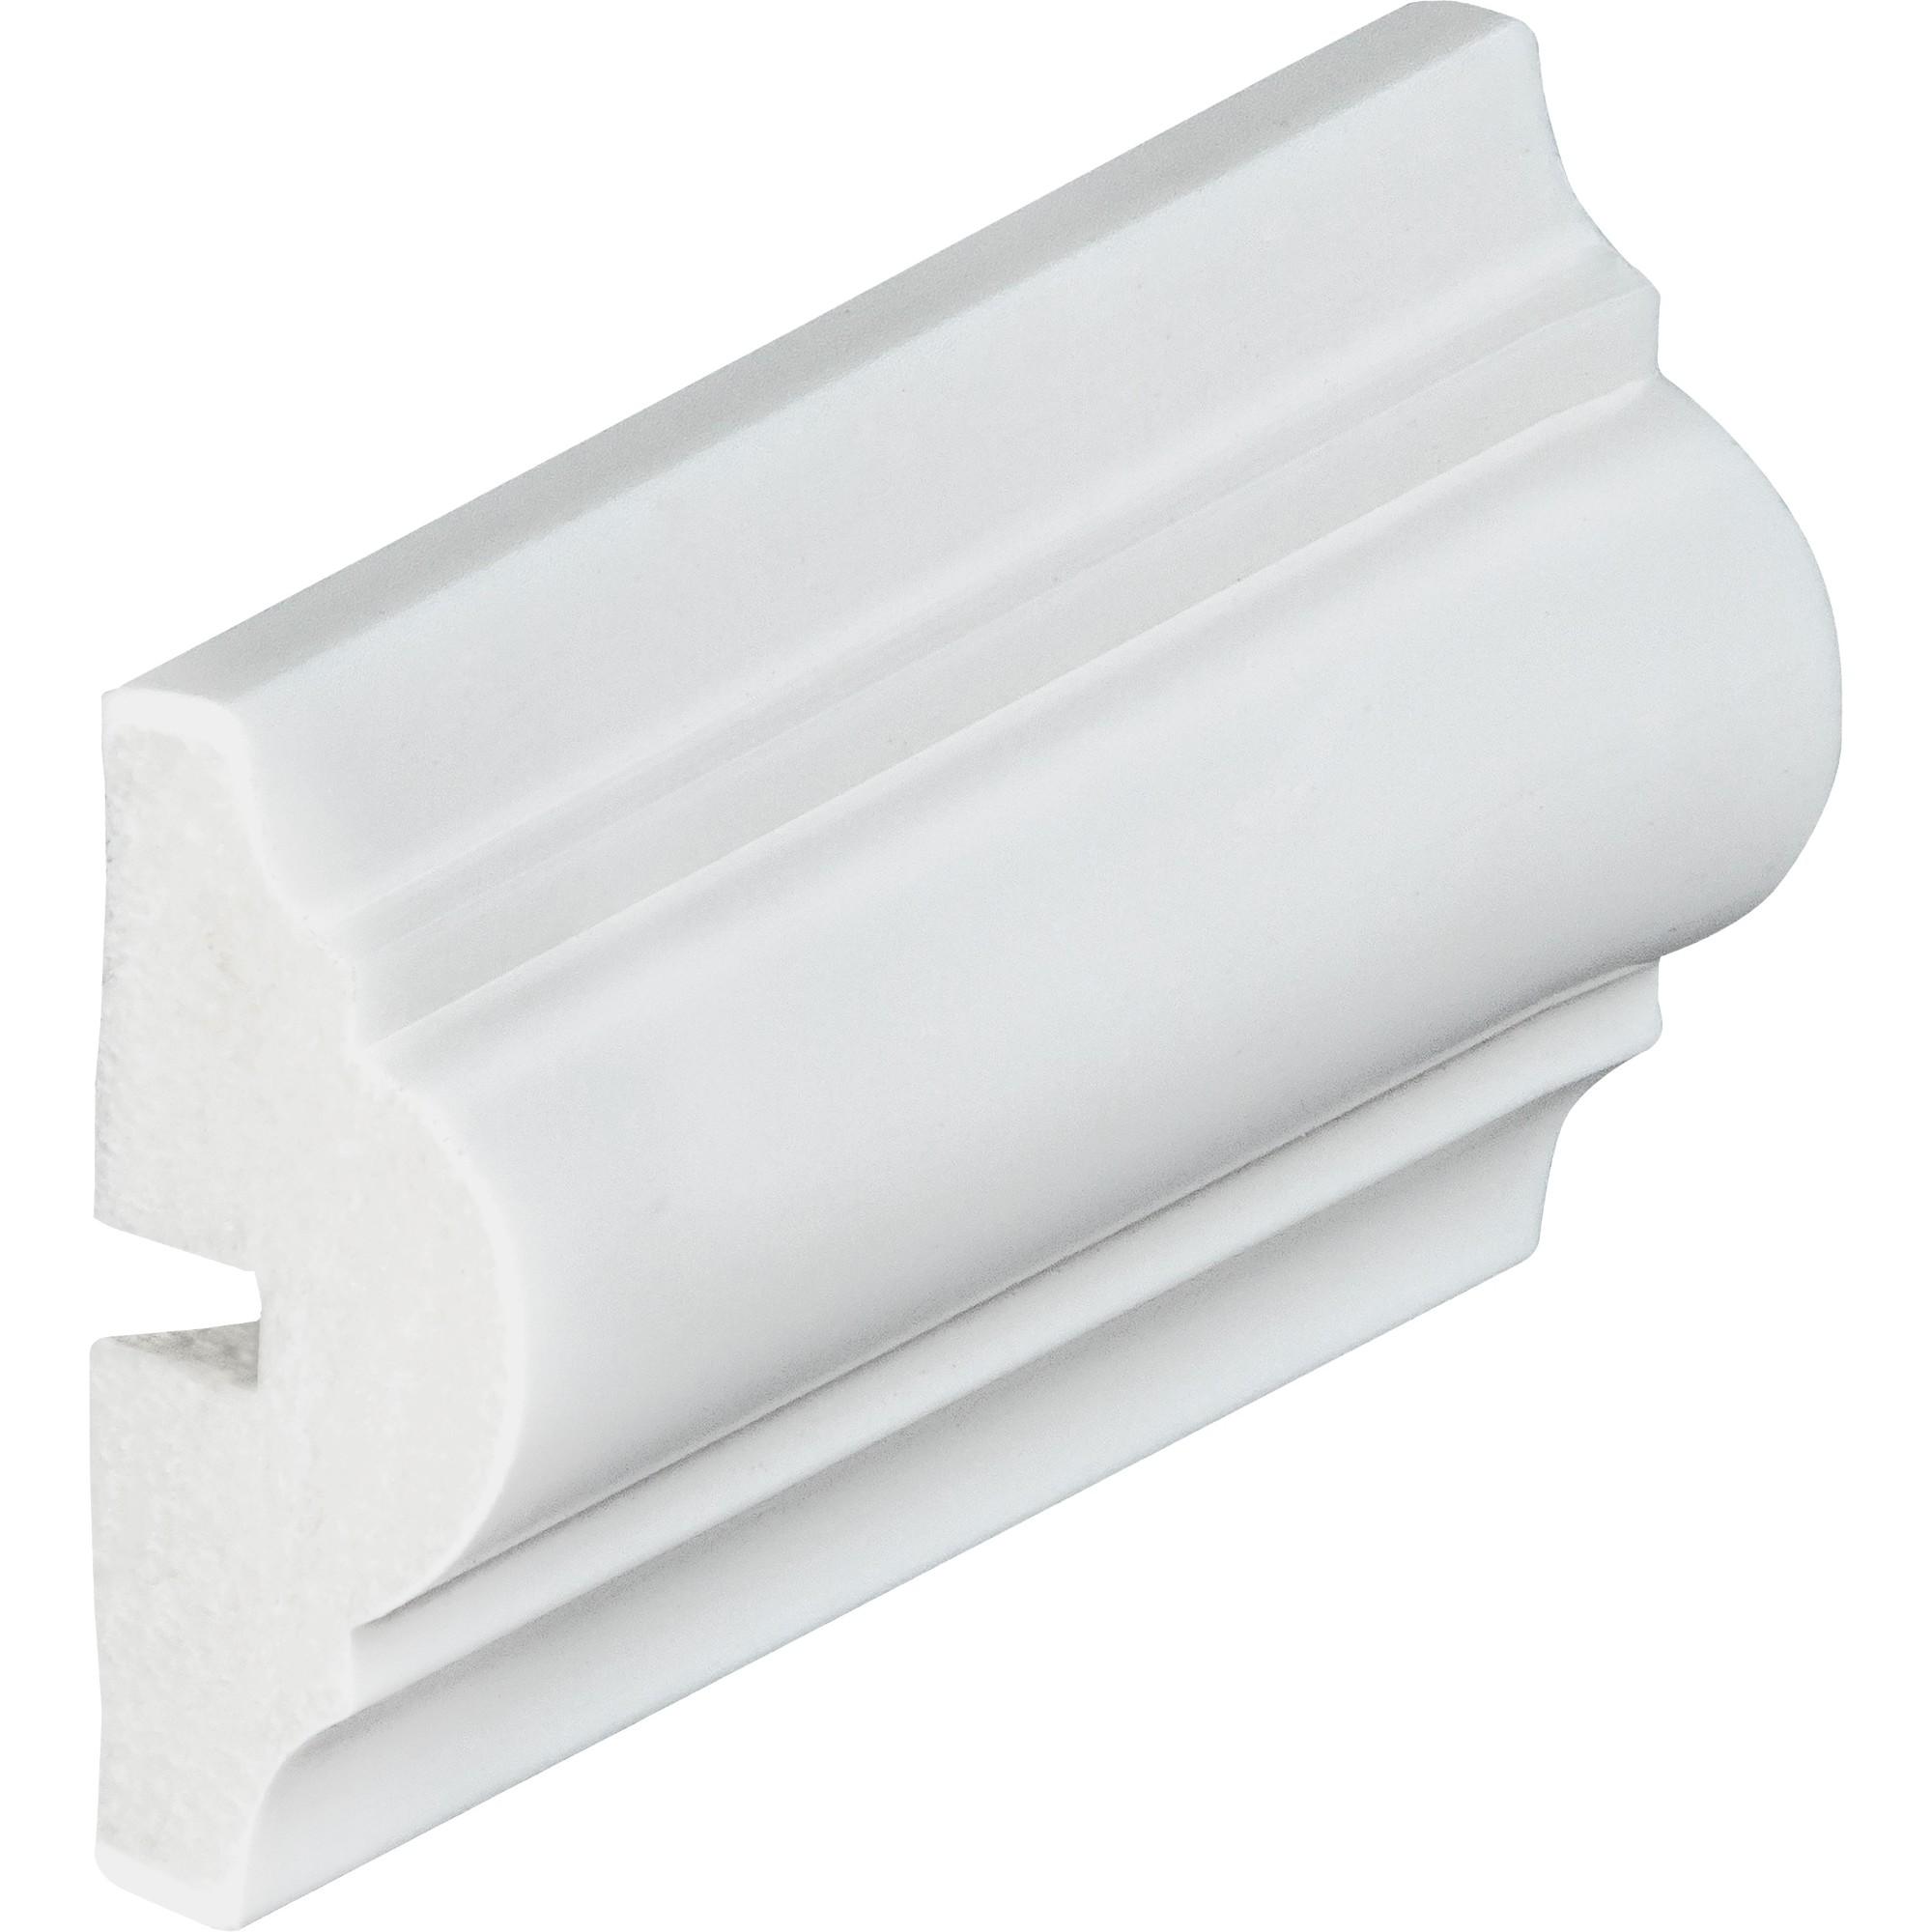 Rodameio 6 x 240 cm Poliestireno Branco - Arquitech